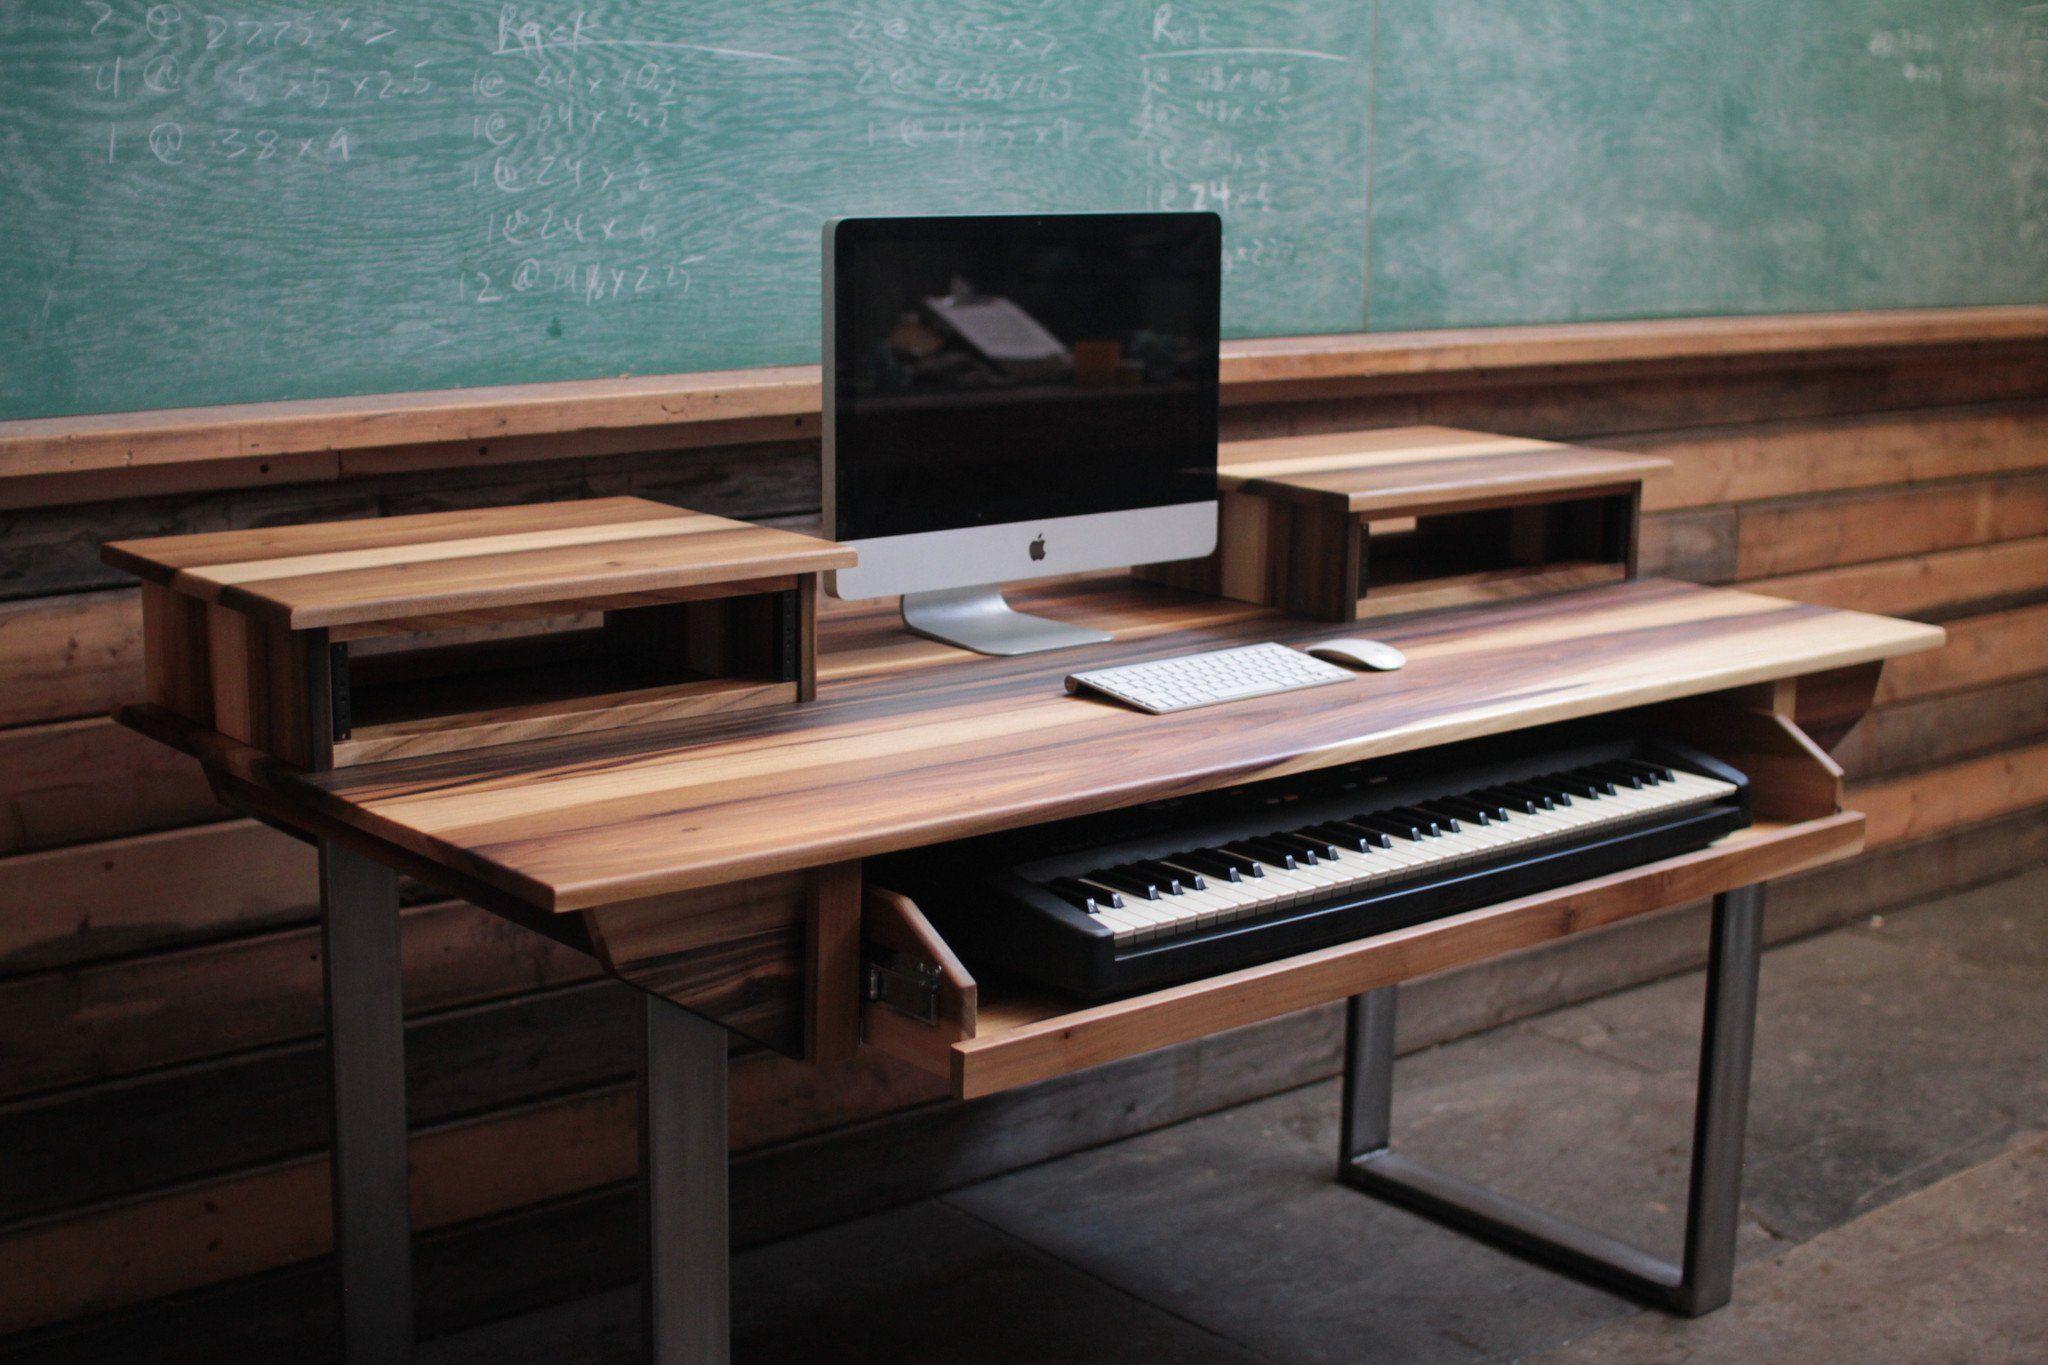 Mid Size 61 key Studio Desk for Audio  Video  Music